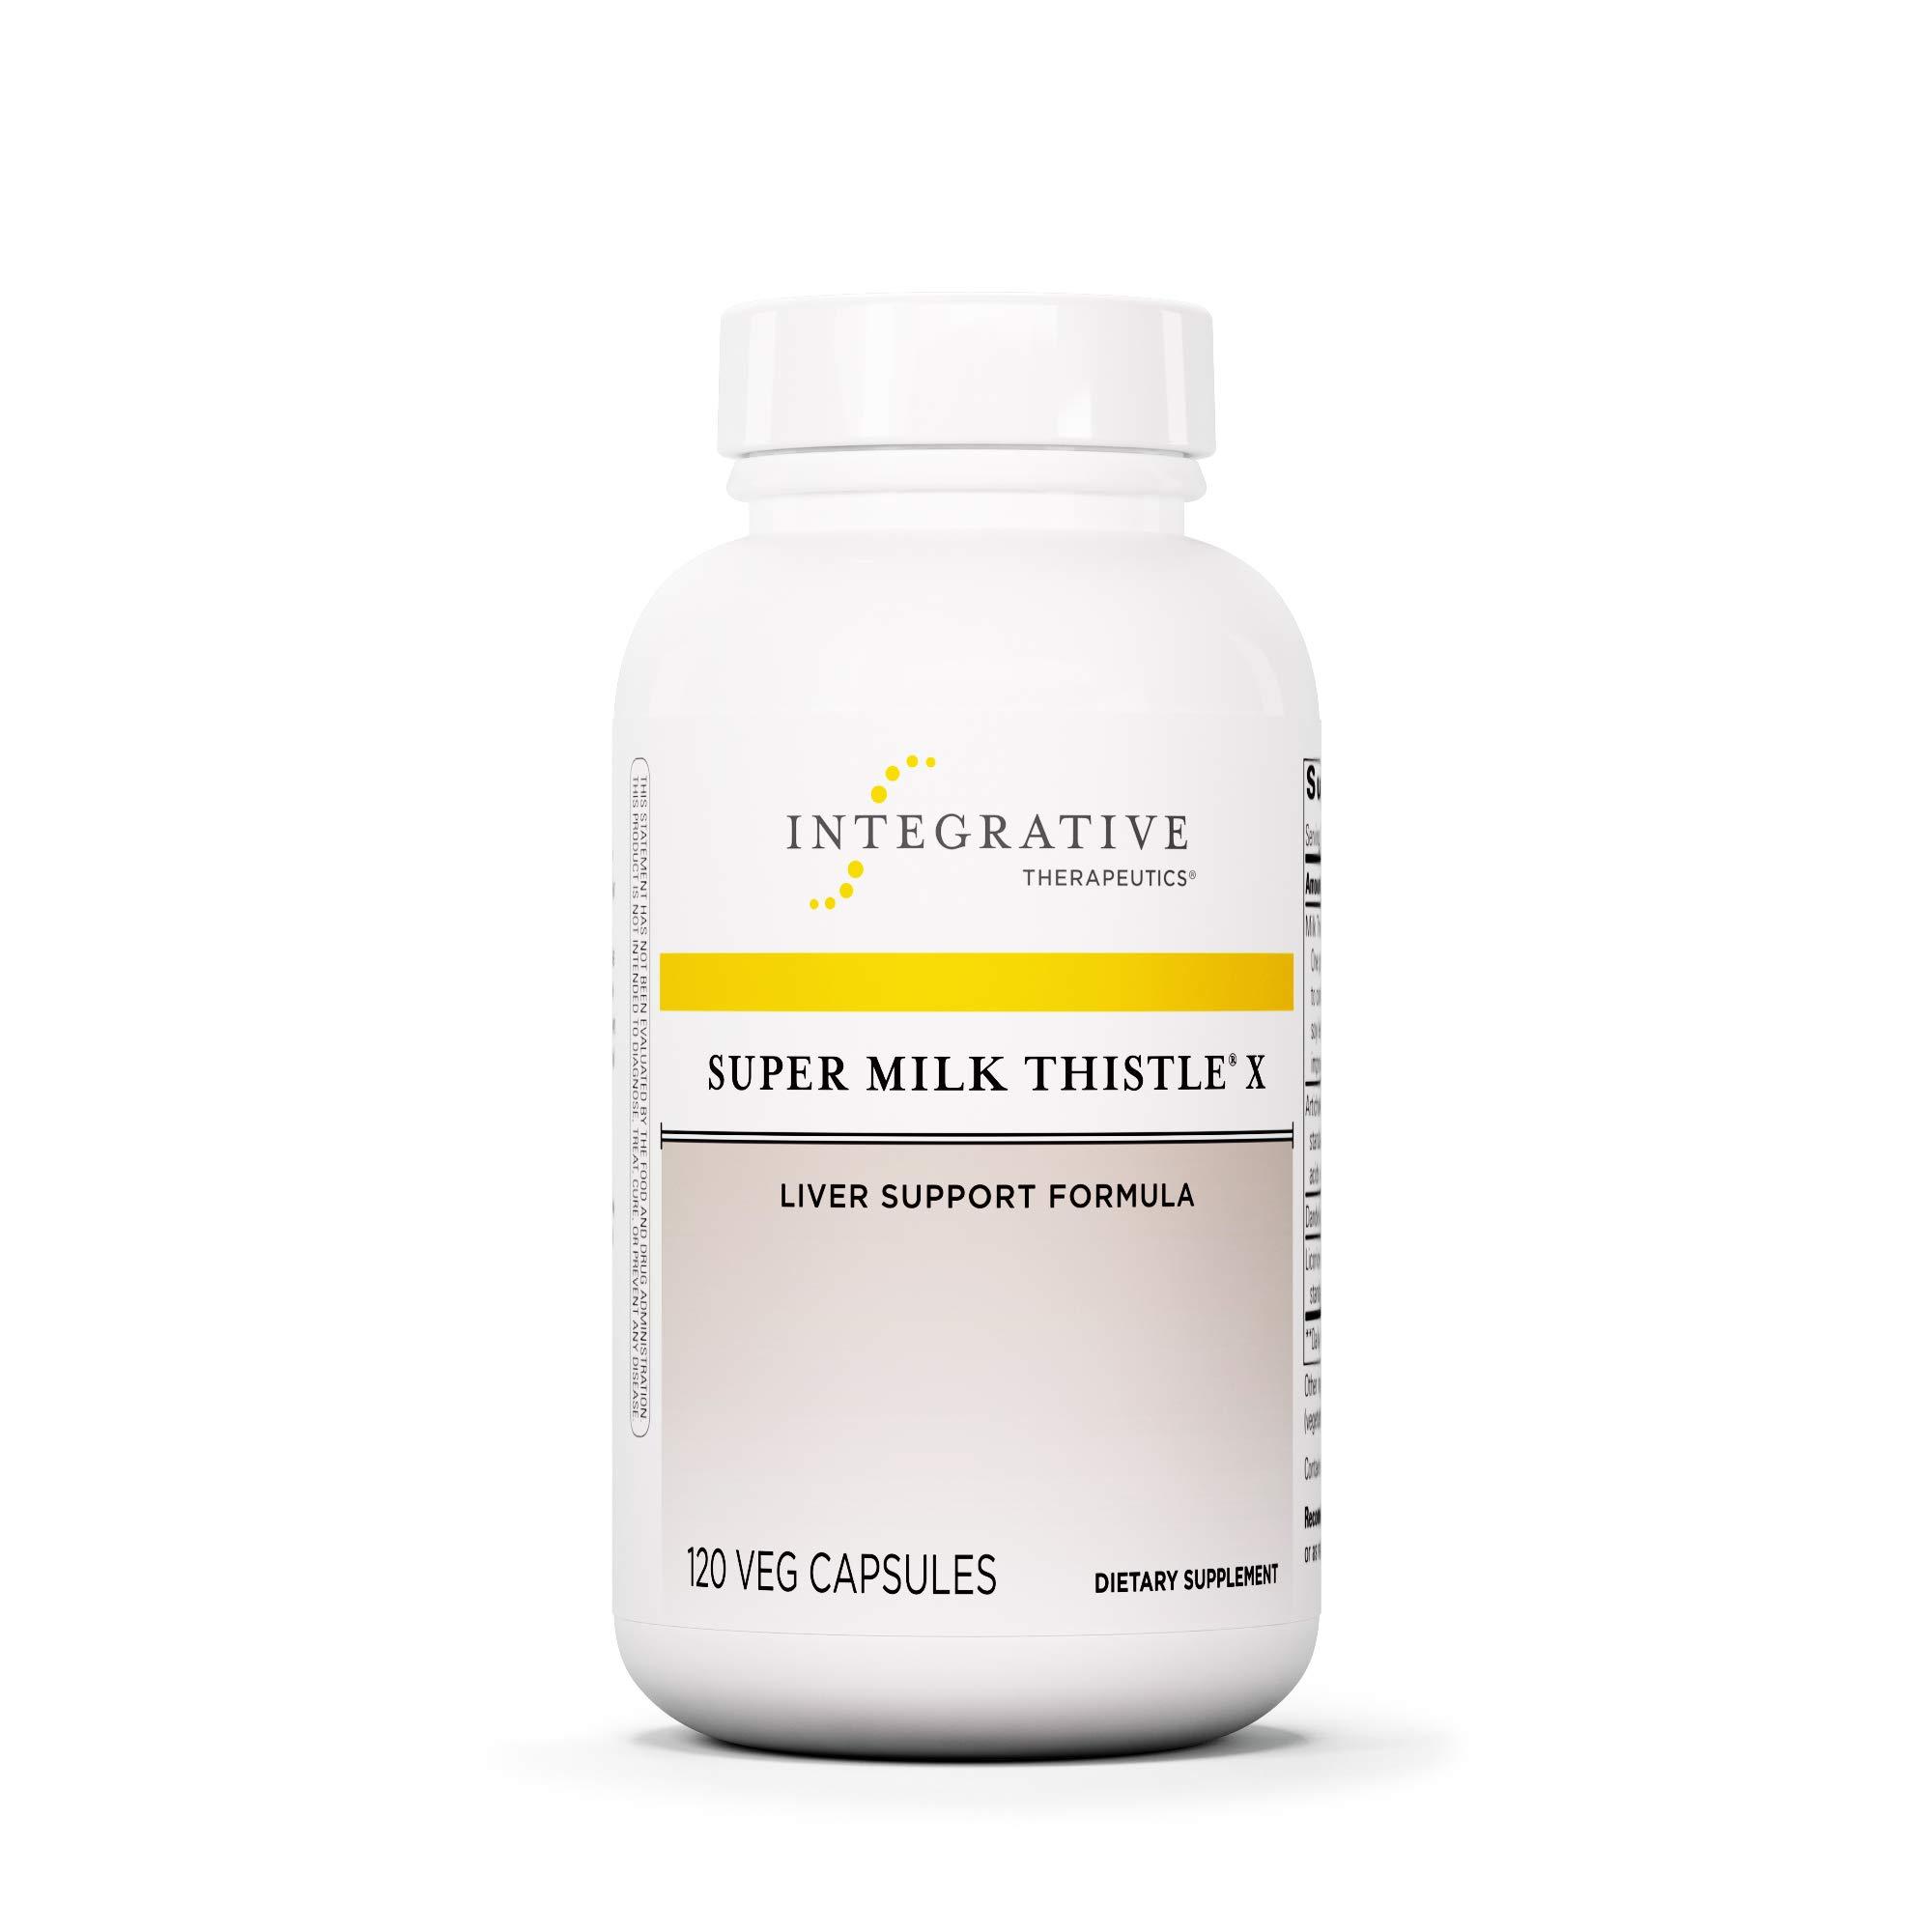 Integrative Therapeutics - Super Milk Thistle X - Liver Support Formula - Blended w/ Artichoke, Dandelion Lead, & Licorice Root Extracts - 120 Capsules